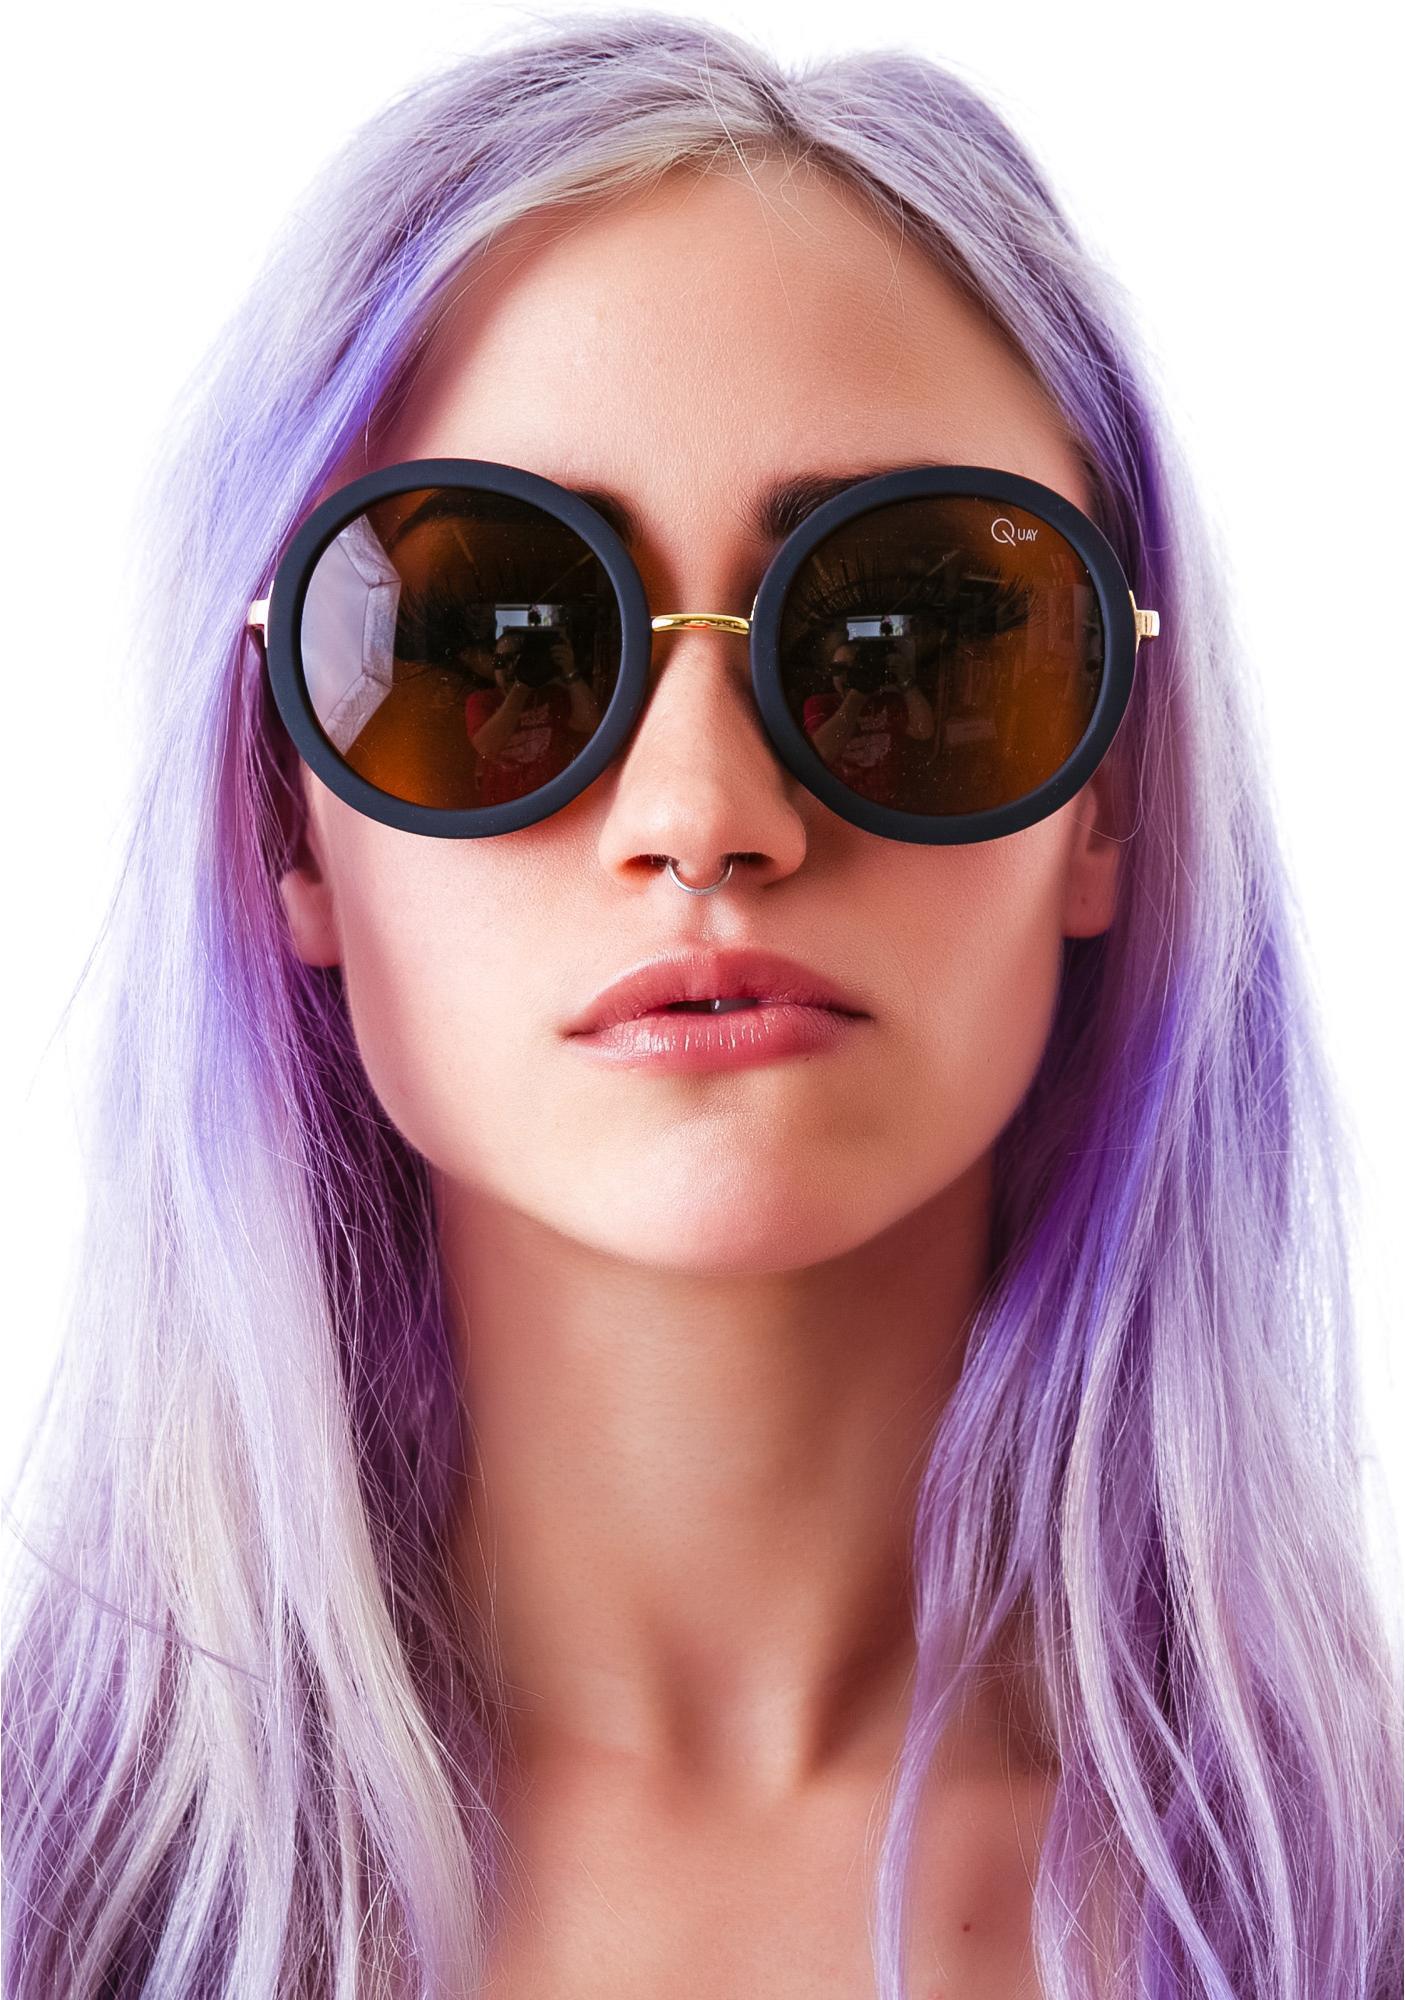 Quay Eyeware Bonny Sunglasses